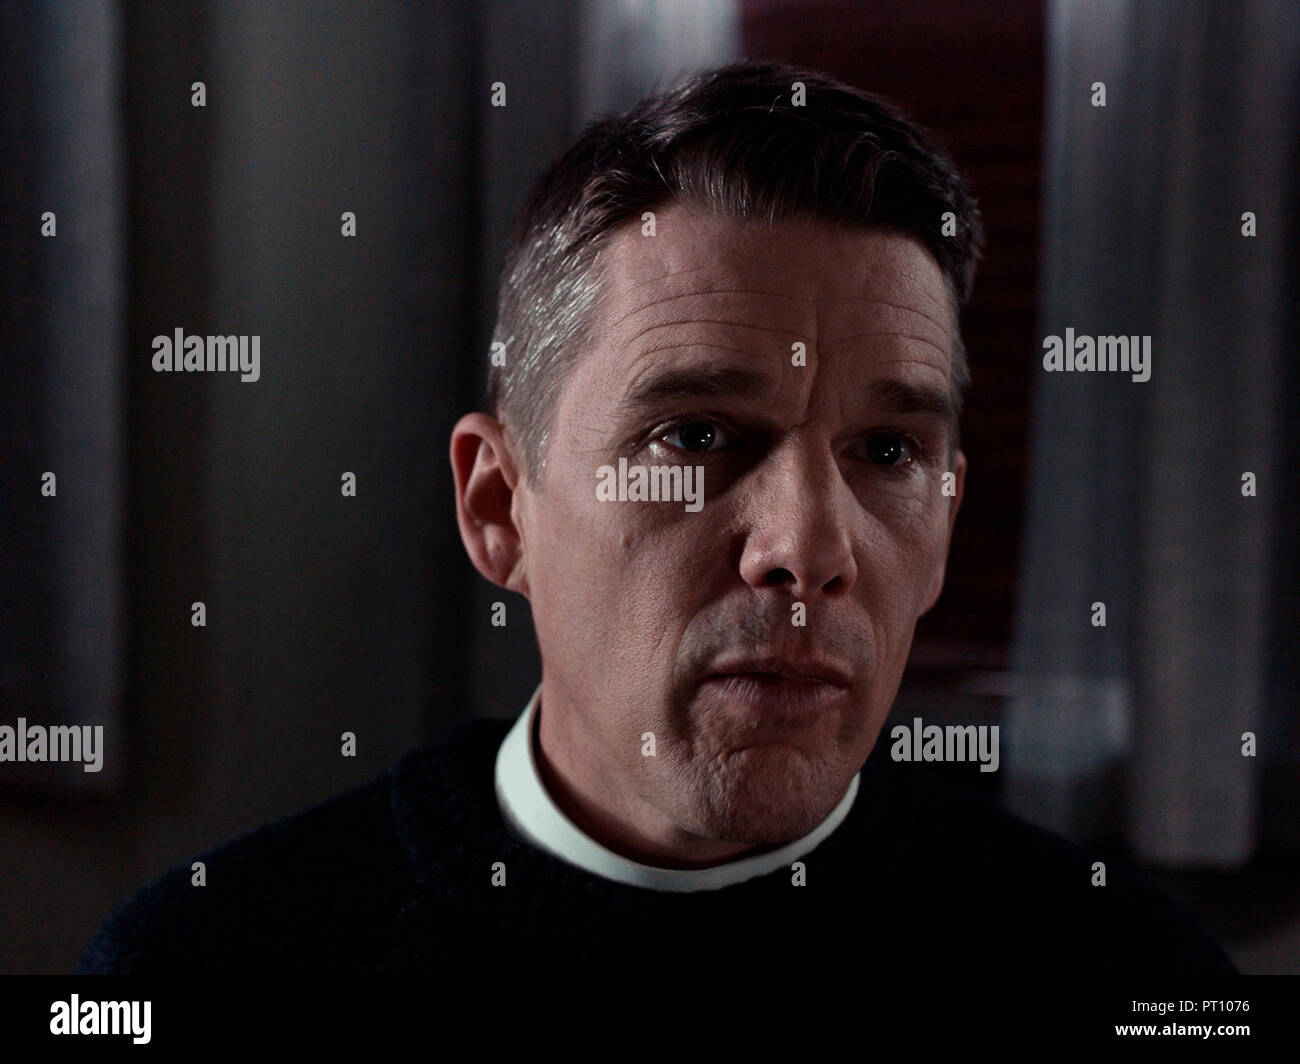 Prod DB © Killer Films - Fibonacci Films - Arclight Films - Omeira Studio Partners / DR FIRST REFORMED de Paul Schrader 2017 USA Ethan Hawke. pretre; - Stock Image